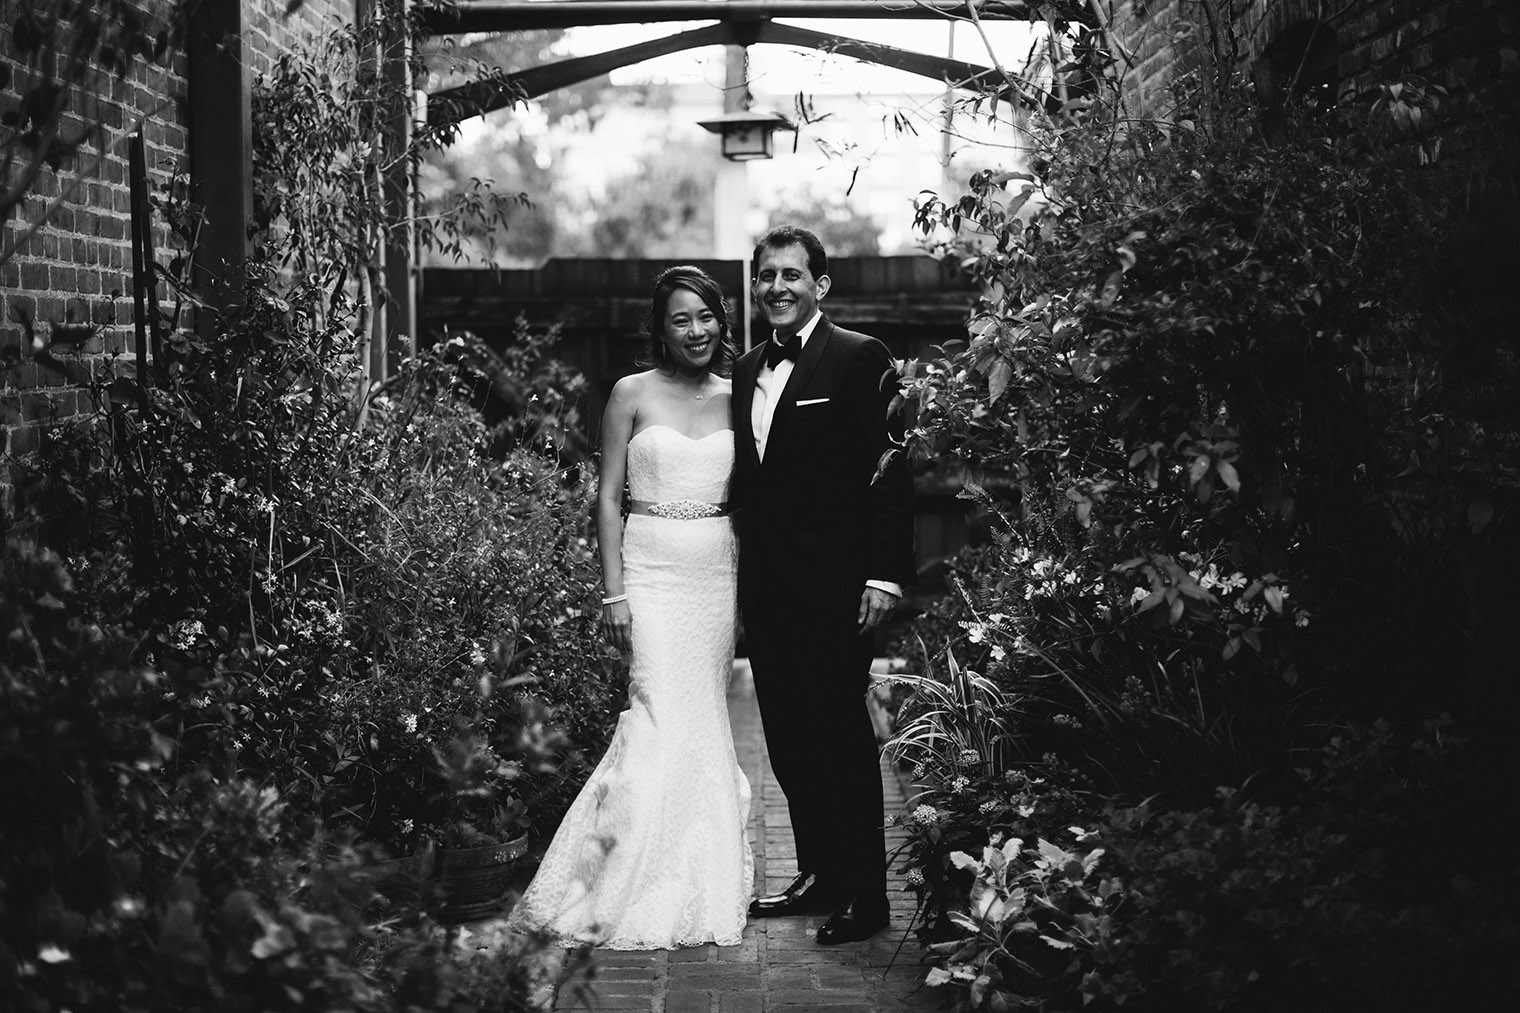 Happy Trails wedding photographer